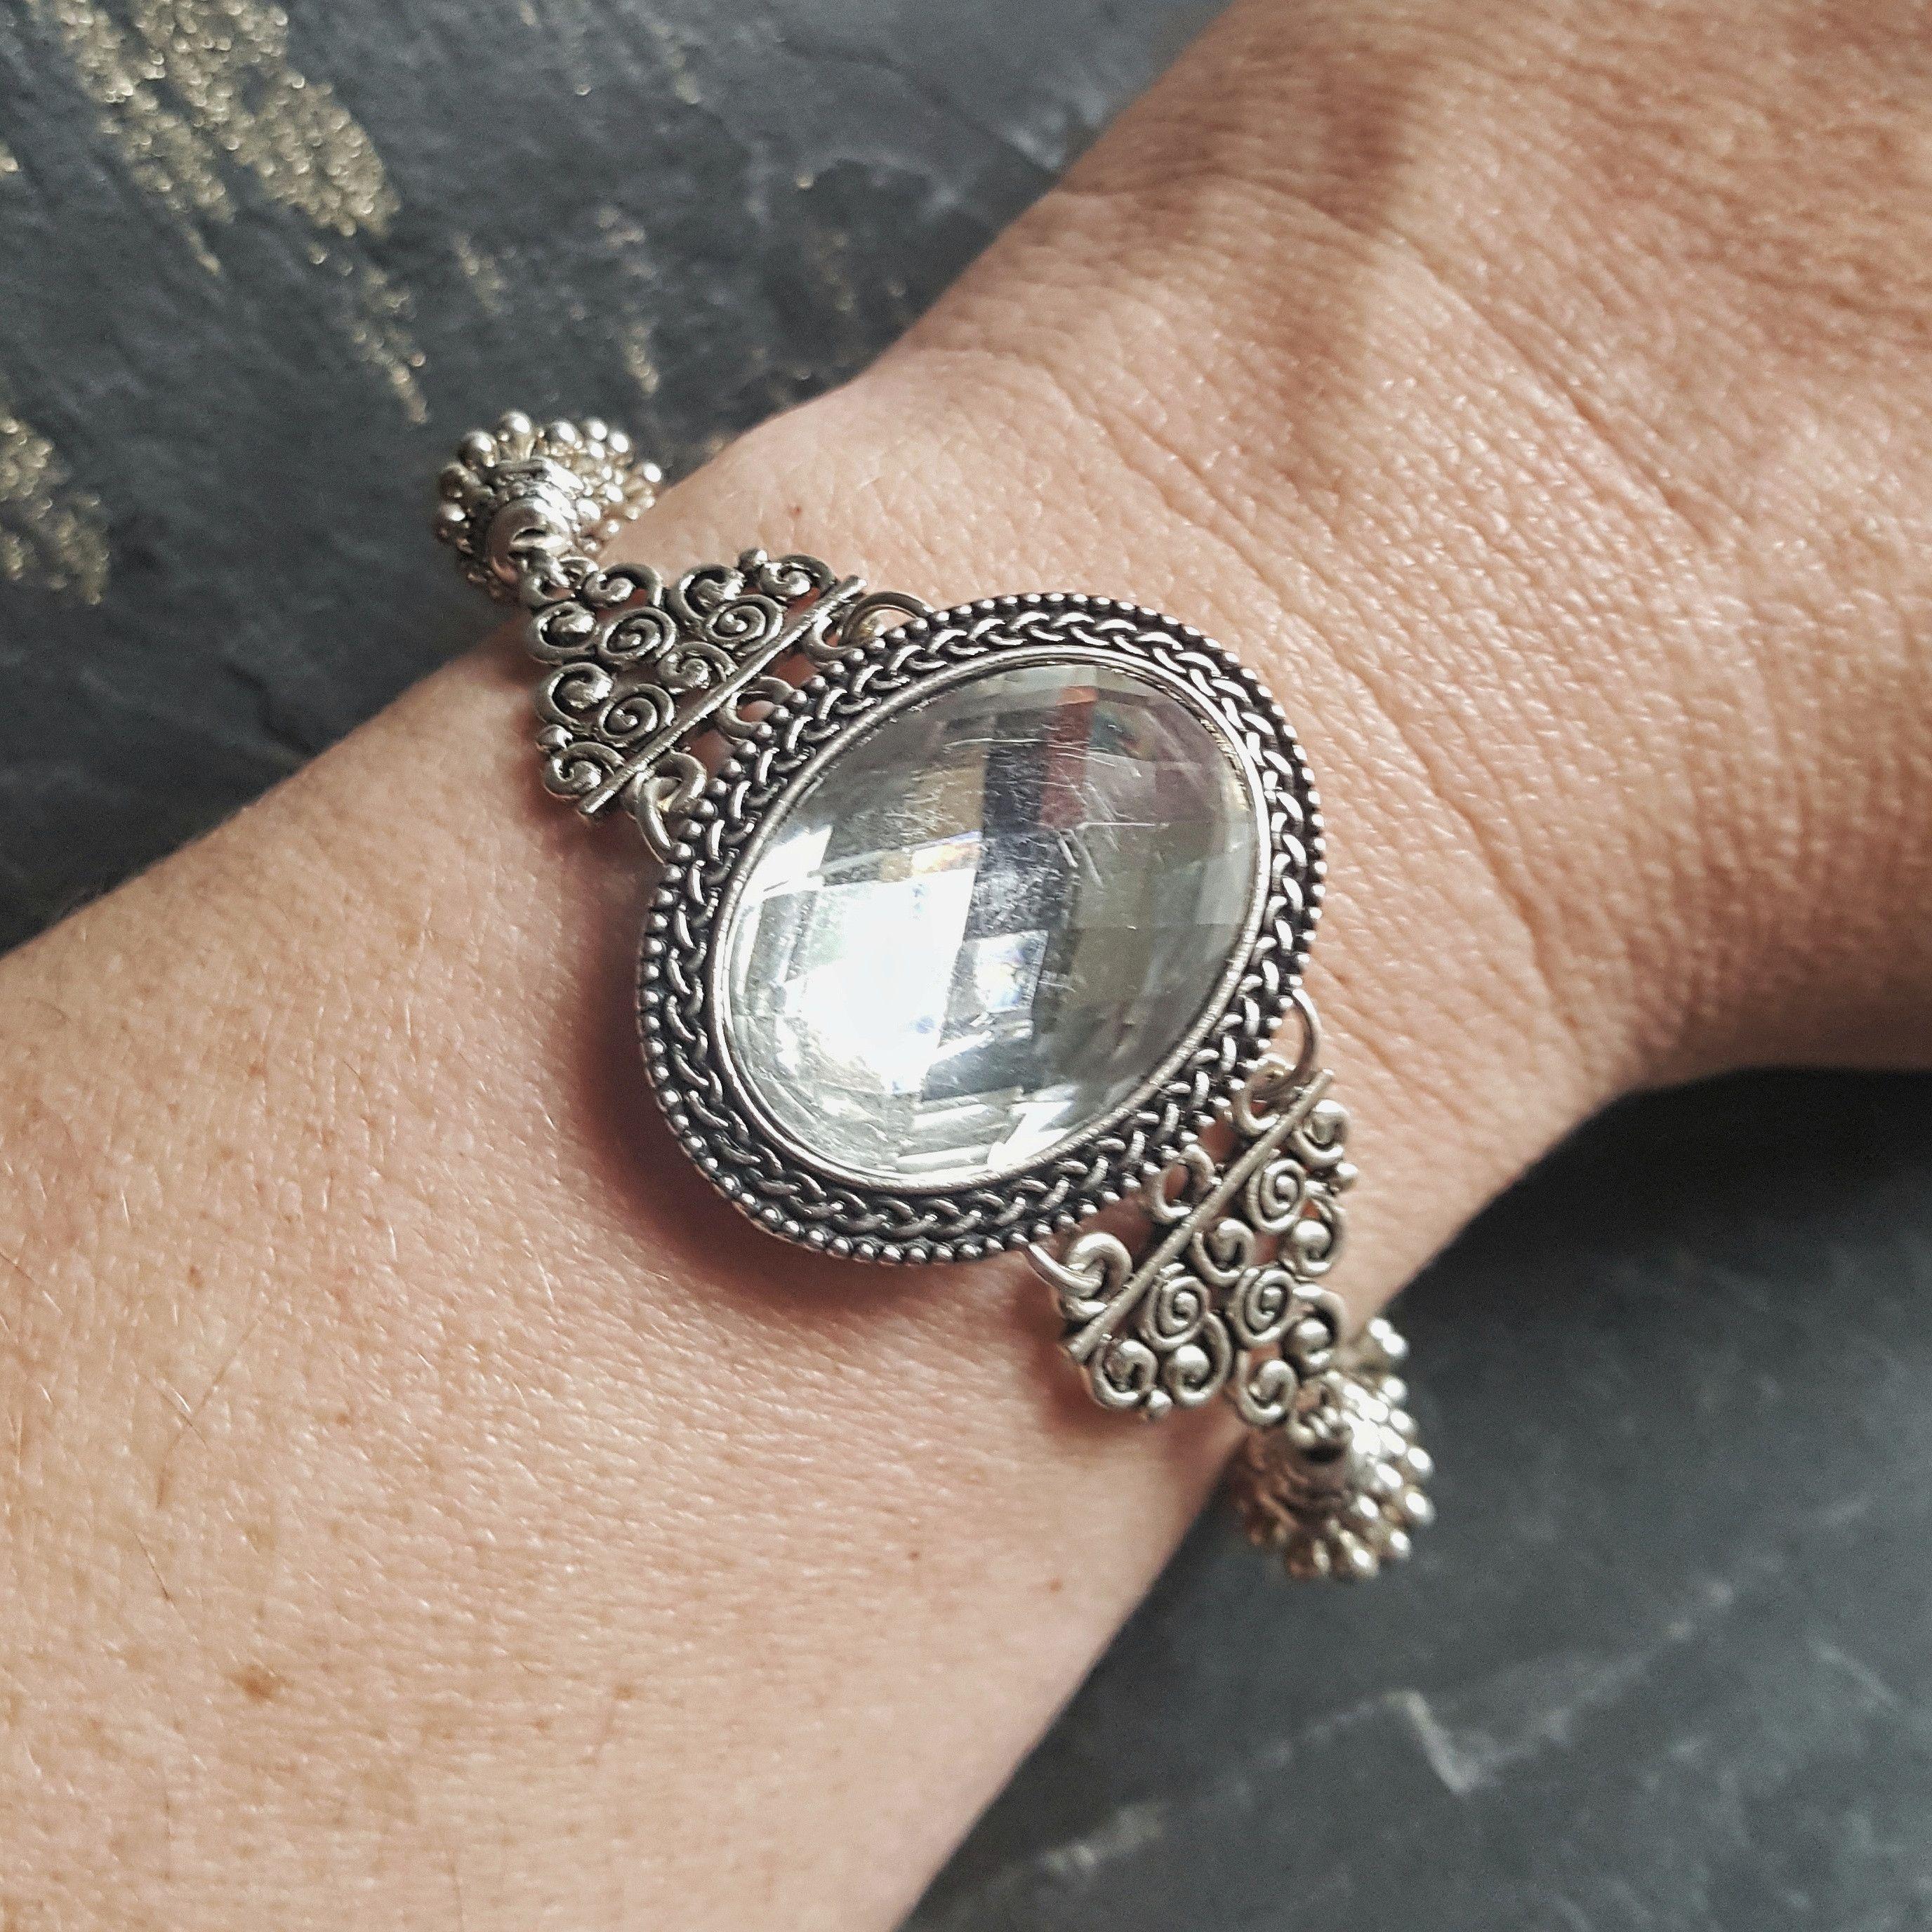 Rhinestone Cocktail Bracelet - Handmade Bridal Jewelry - Ren Faire - Princess Costume Accessories